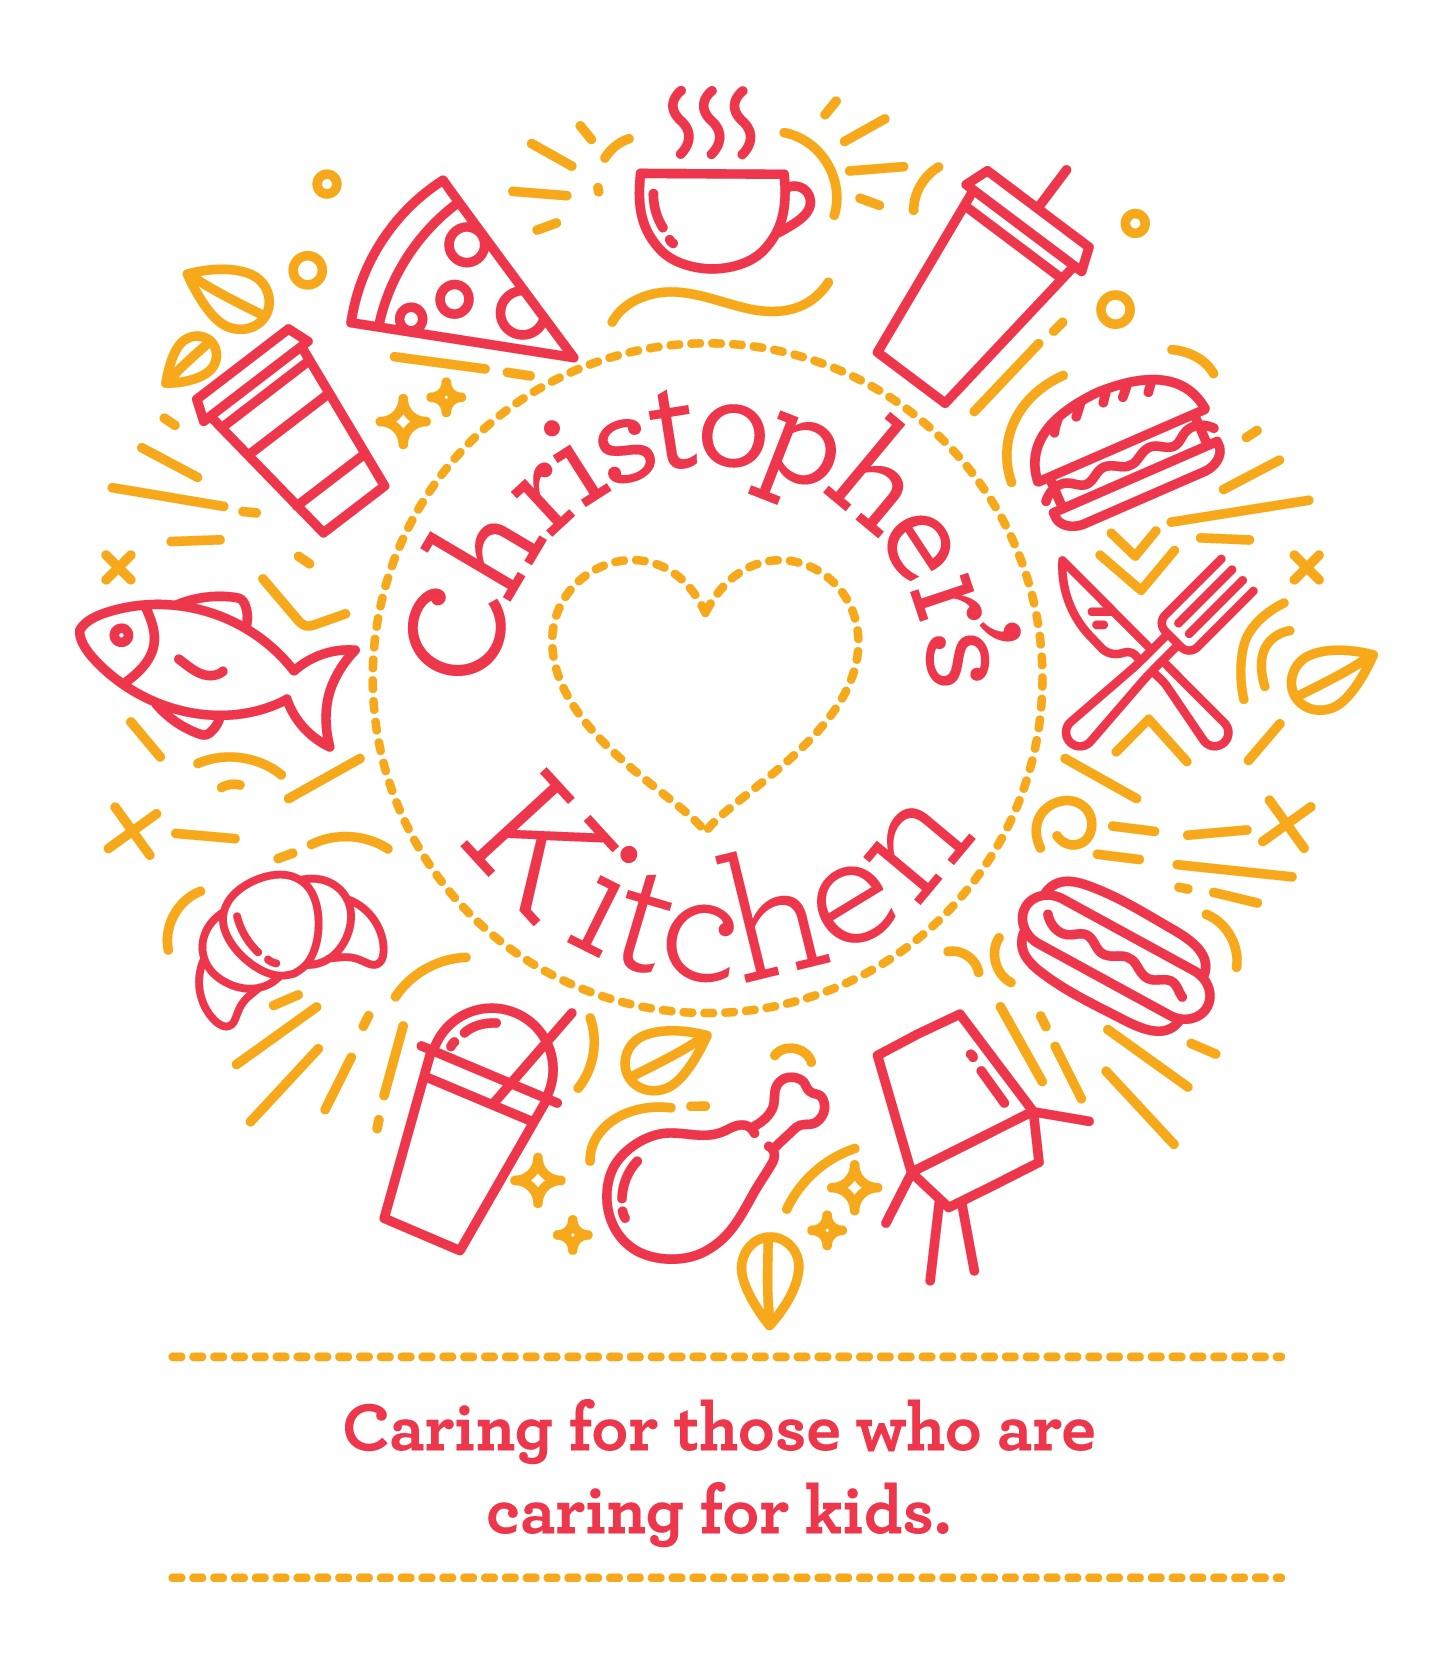 christophers_kitchen_tag_2c.jpg